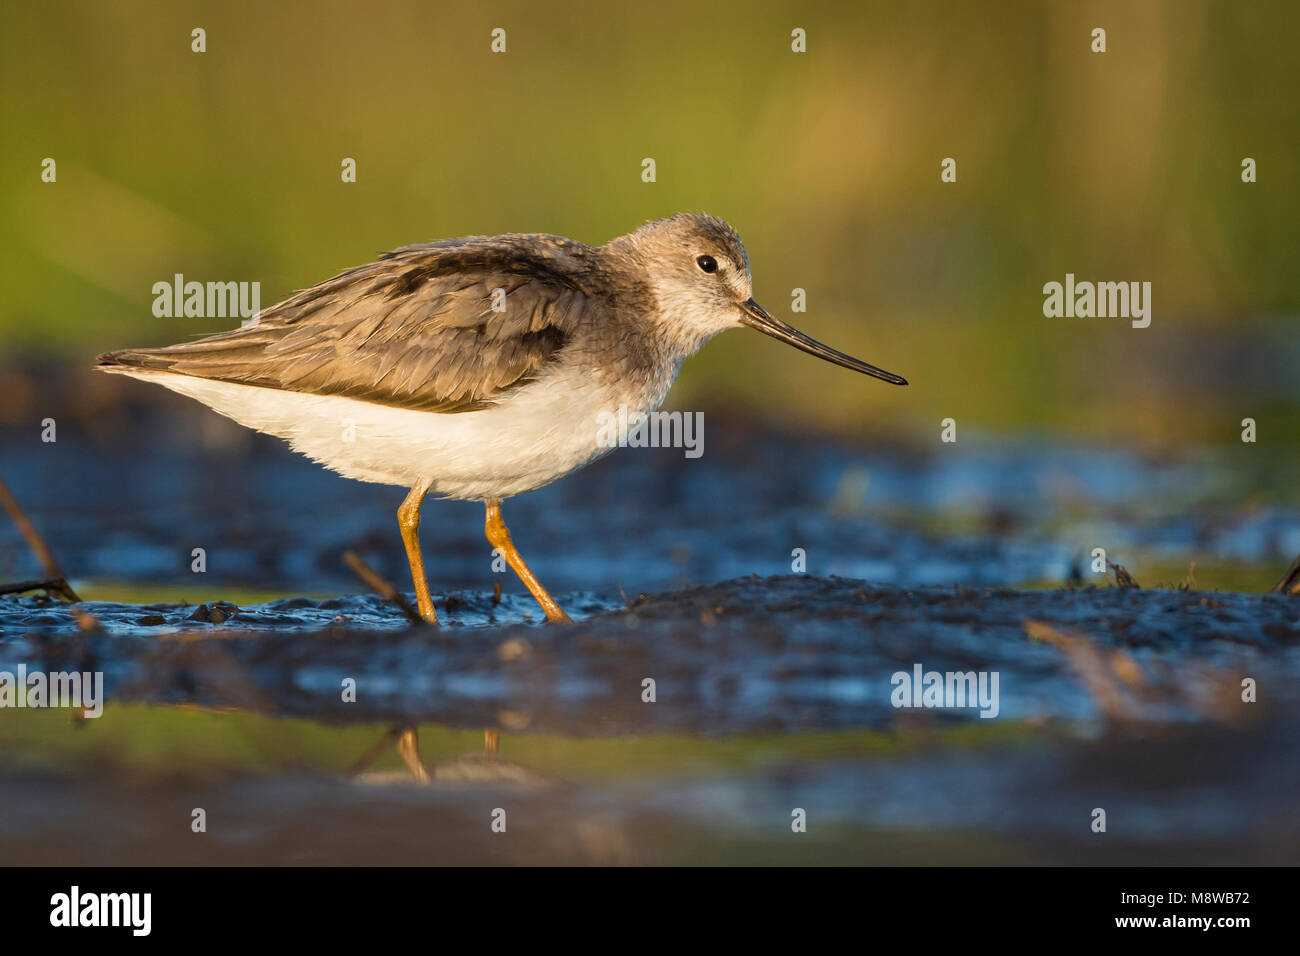 Terek Sandpiper - Terekwasserläufer - Xenus cinereus, Oman Stock Photo